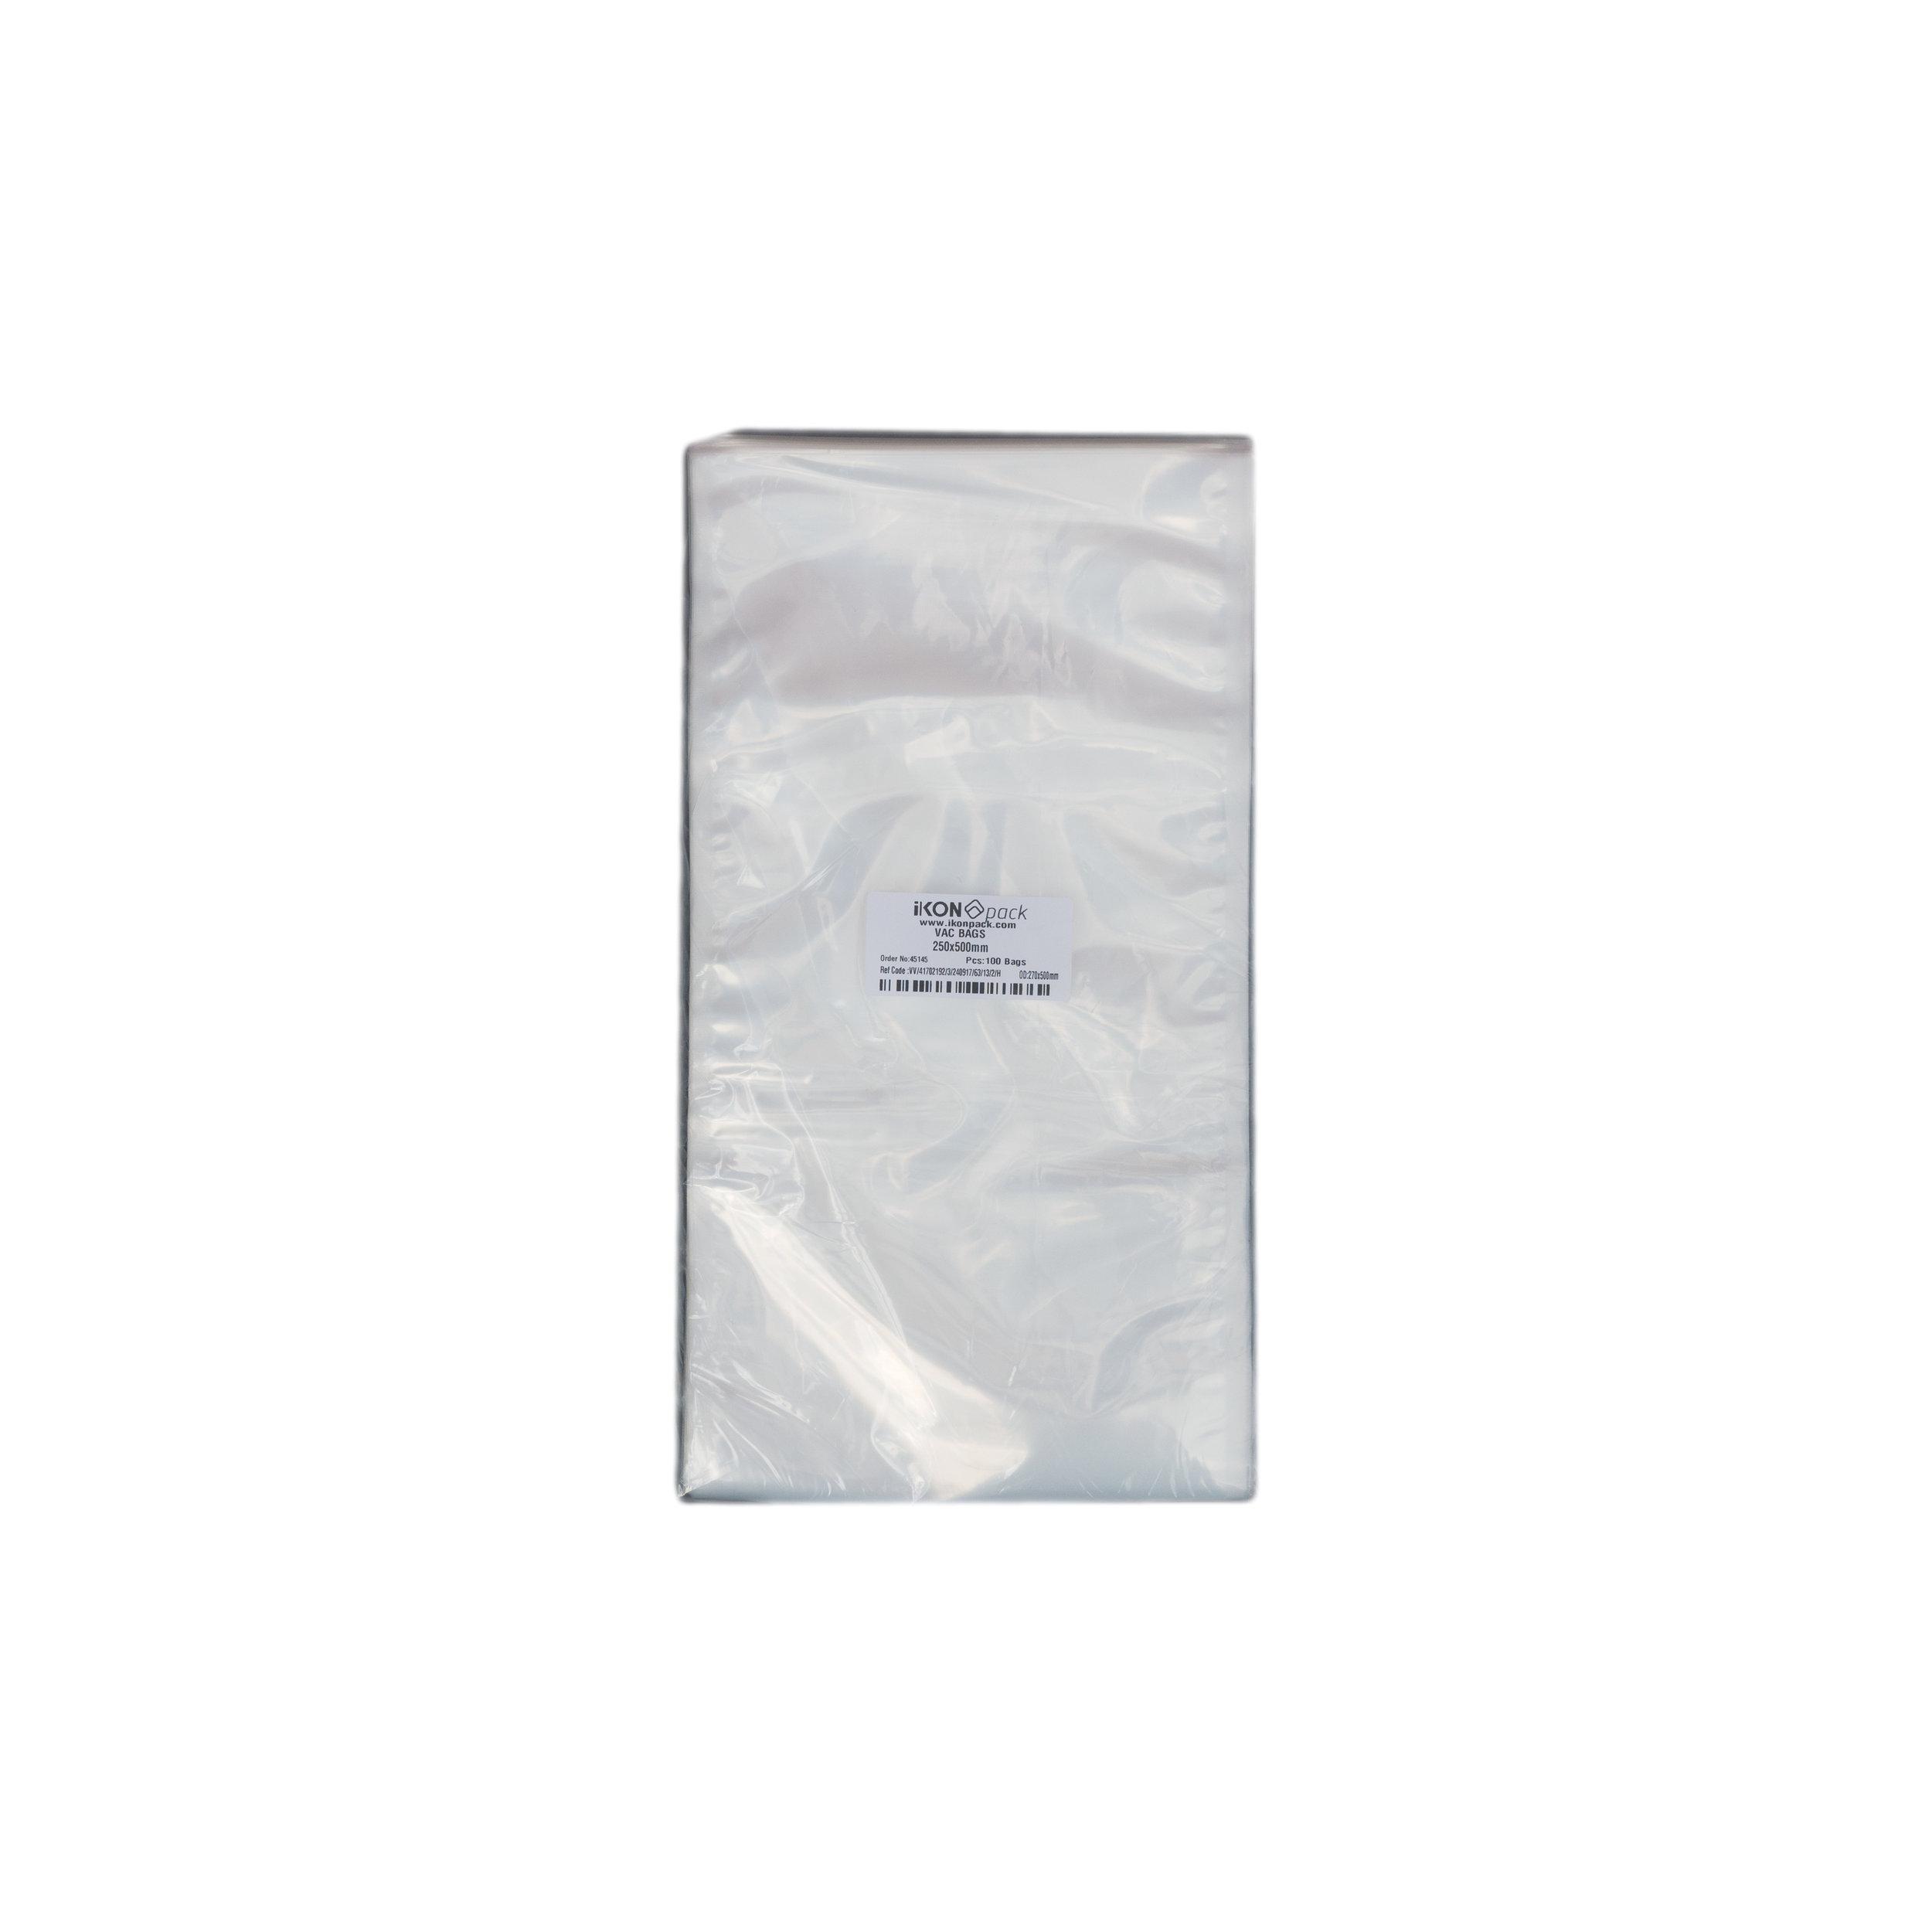 iK-VAC2550      VACUUM POUCH 70 MICRON 250X500    100 per slv 1000 per carton